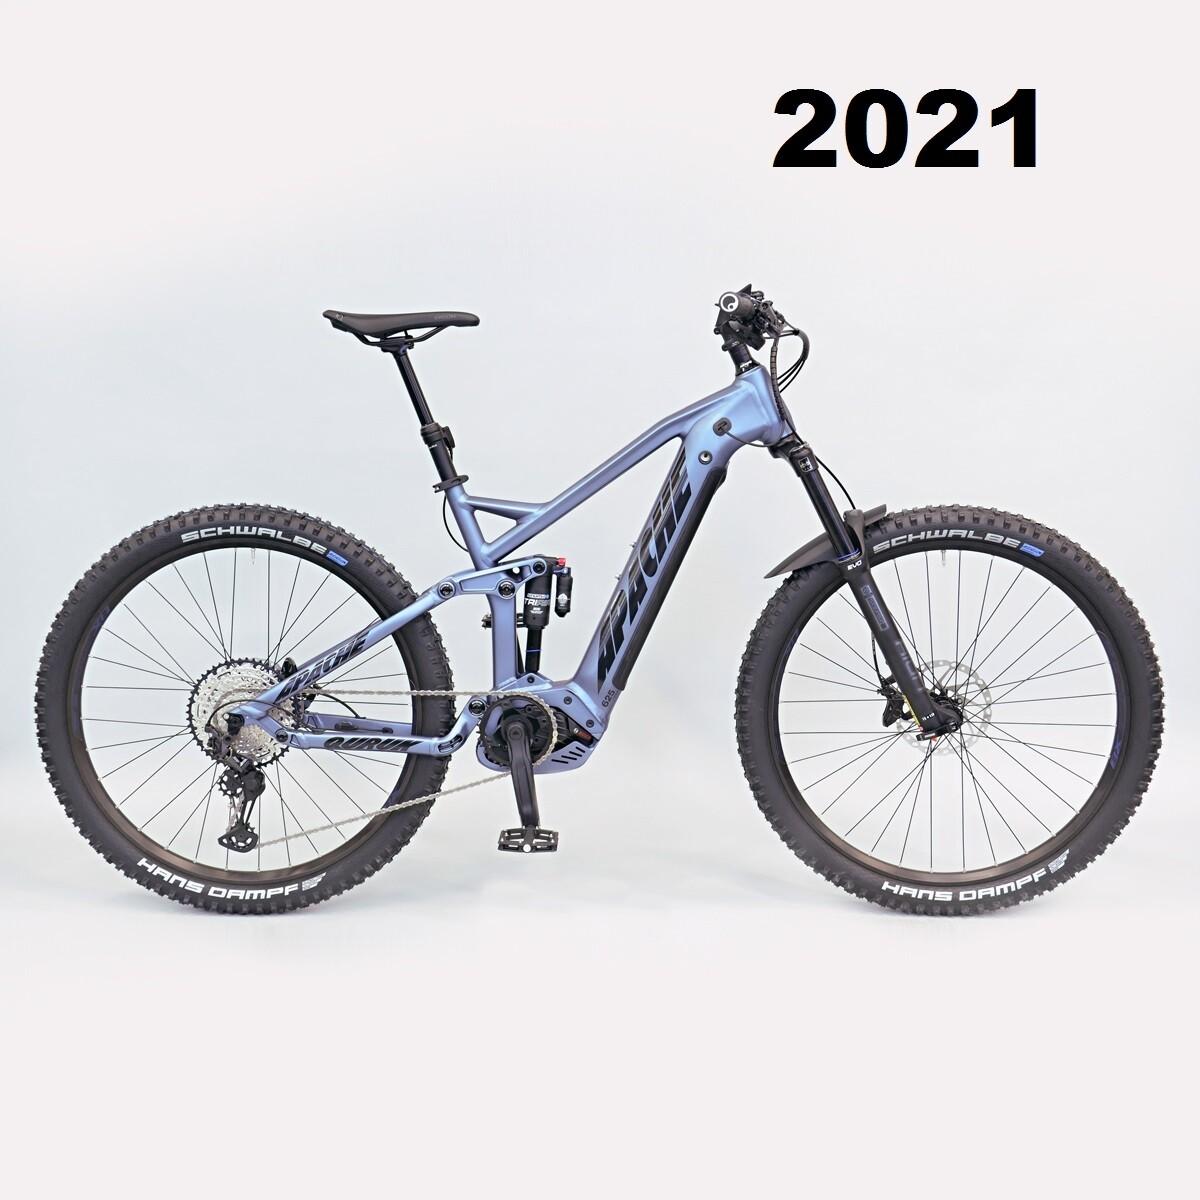 "APACHE QURUK BOSCH PERFORMANCE CX 29"" - eMTB 2021 MALLI ENNAKKOTILATTAVISSA!"